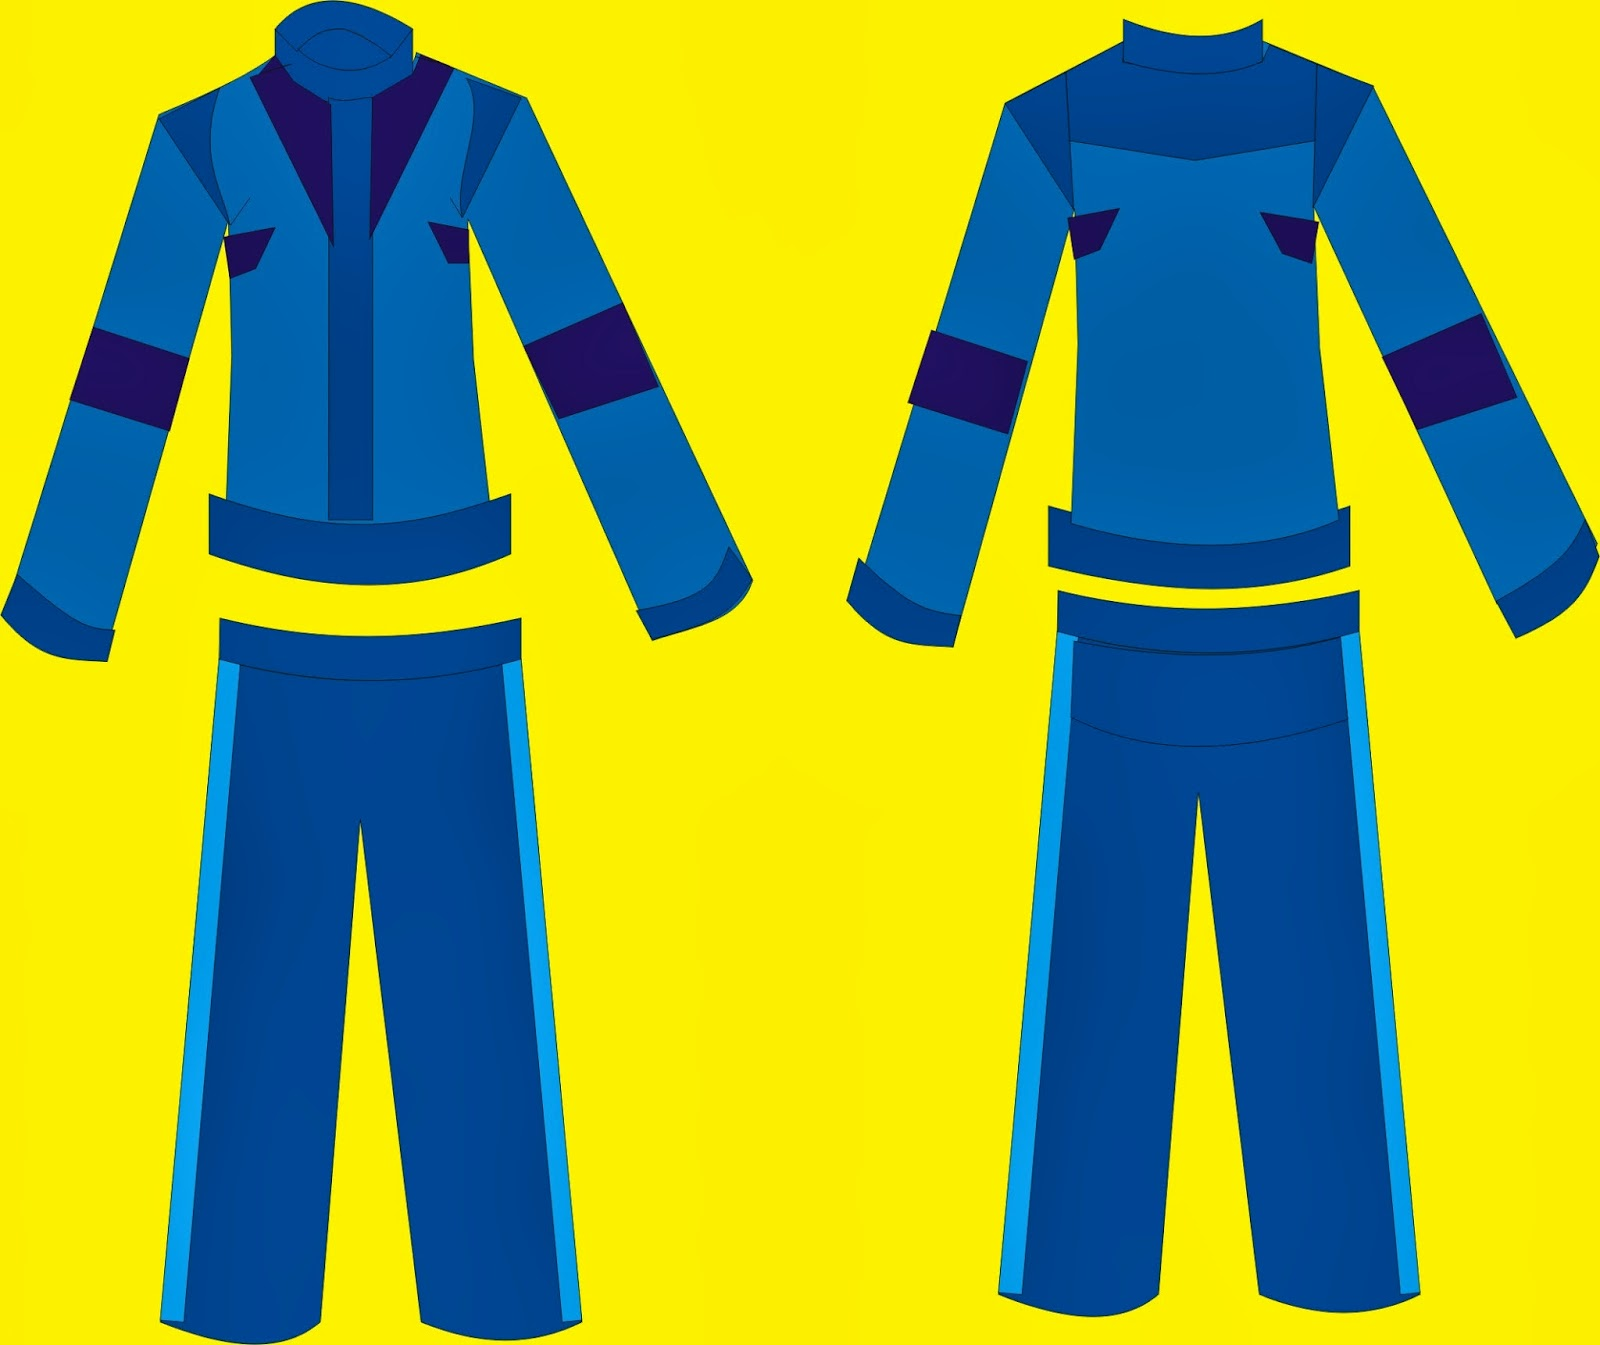 Contoh Desain Kaos Olahraga Sekolah Kejar Setoran